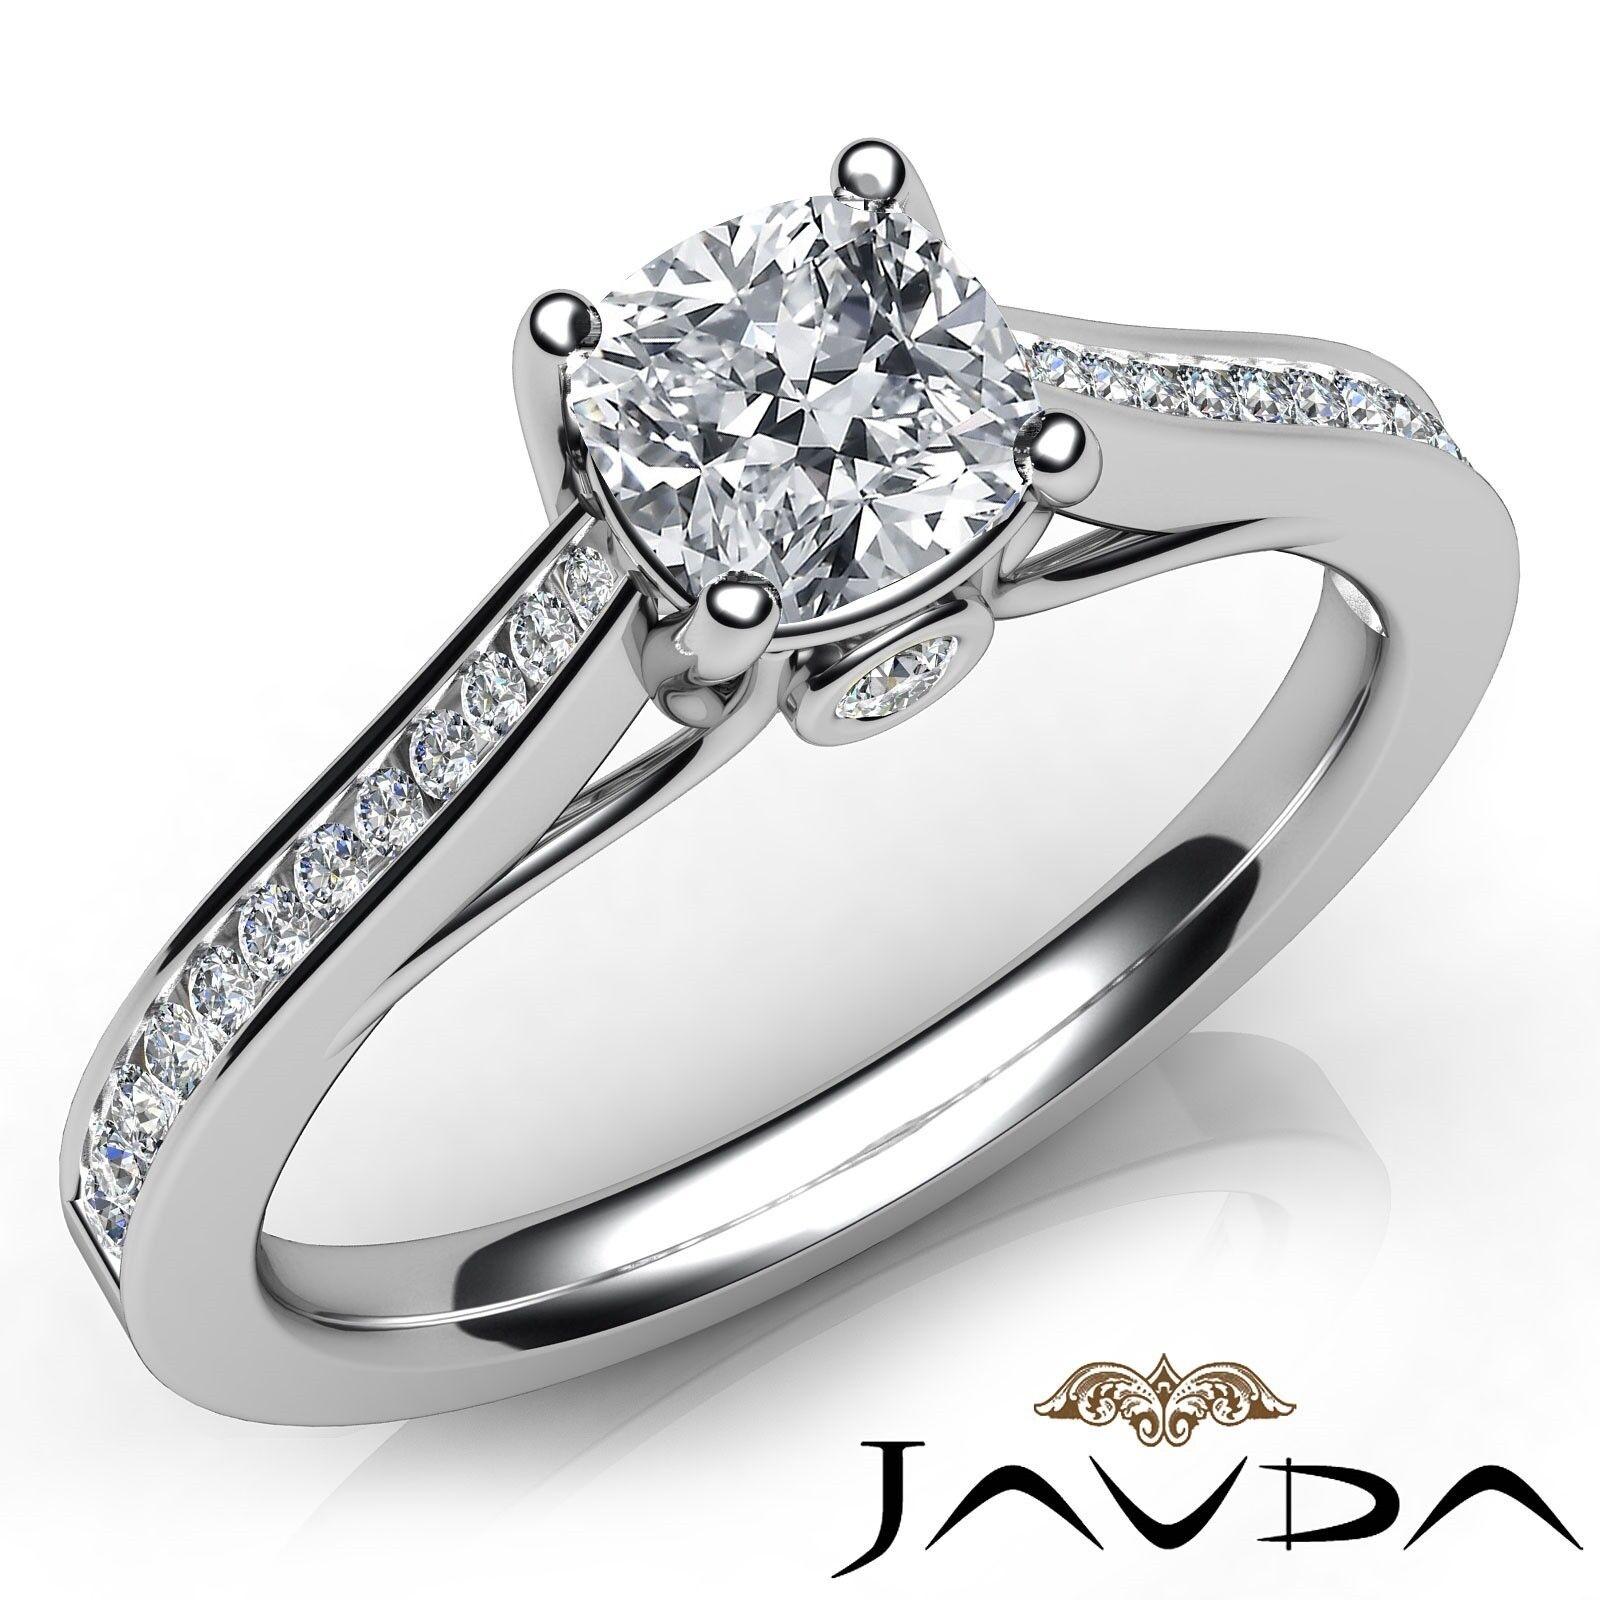 0.8ctw Channel Bezel Prong Set Cushion Diamond Engagement Ring GIA I-VS1 W Gold